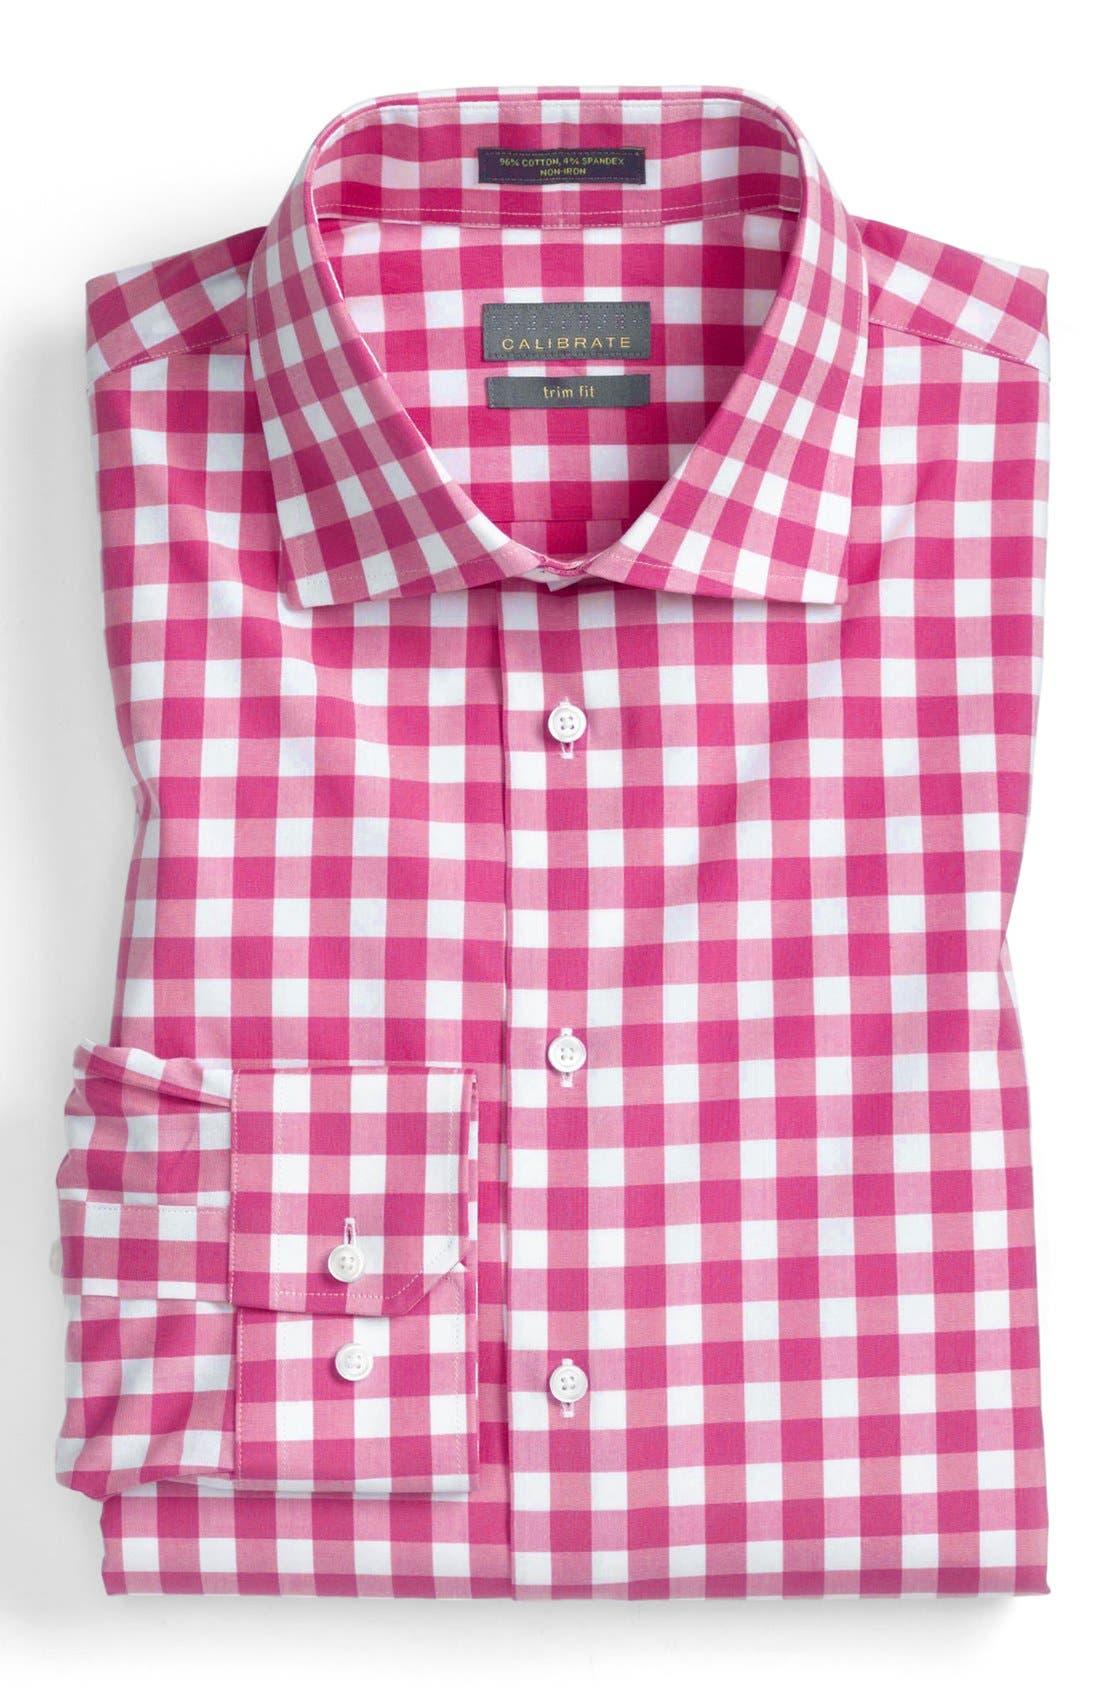 Main Image - Calibrate Trim Fit Non-Iron Gingham Dress Shirt